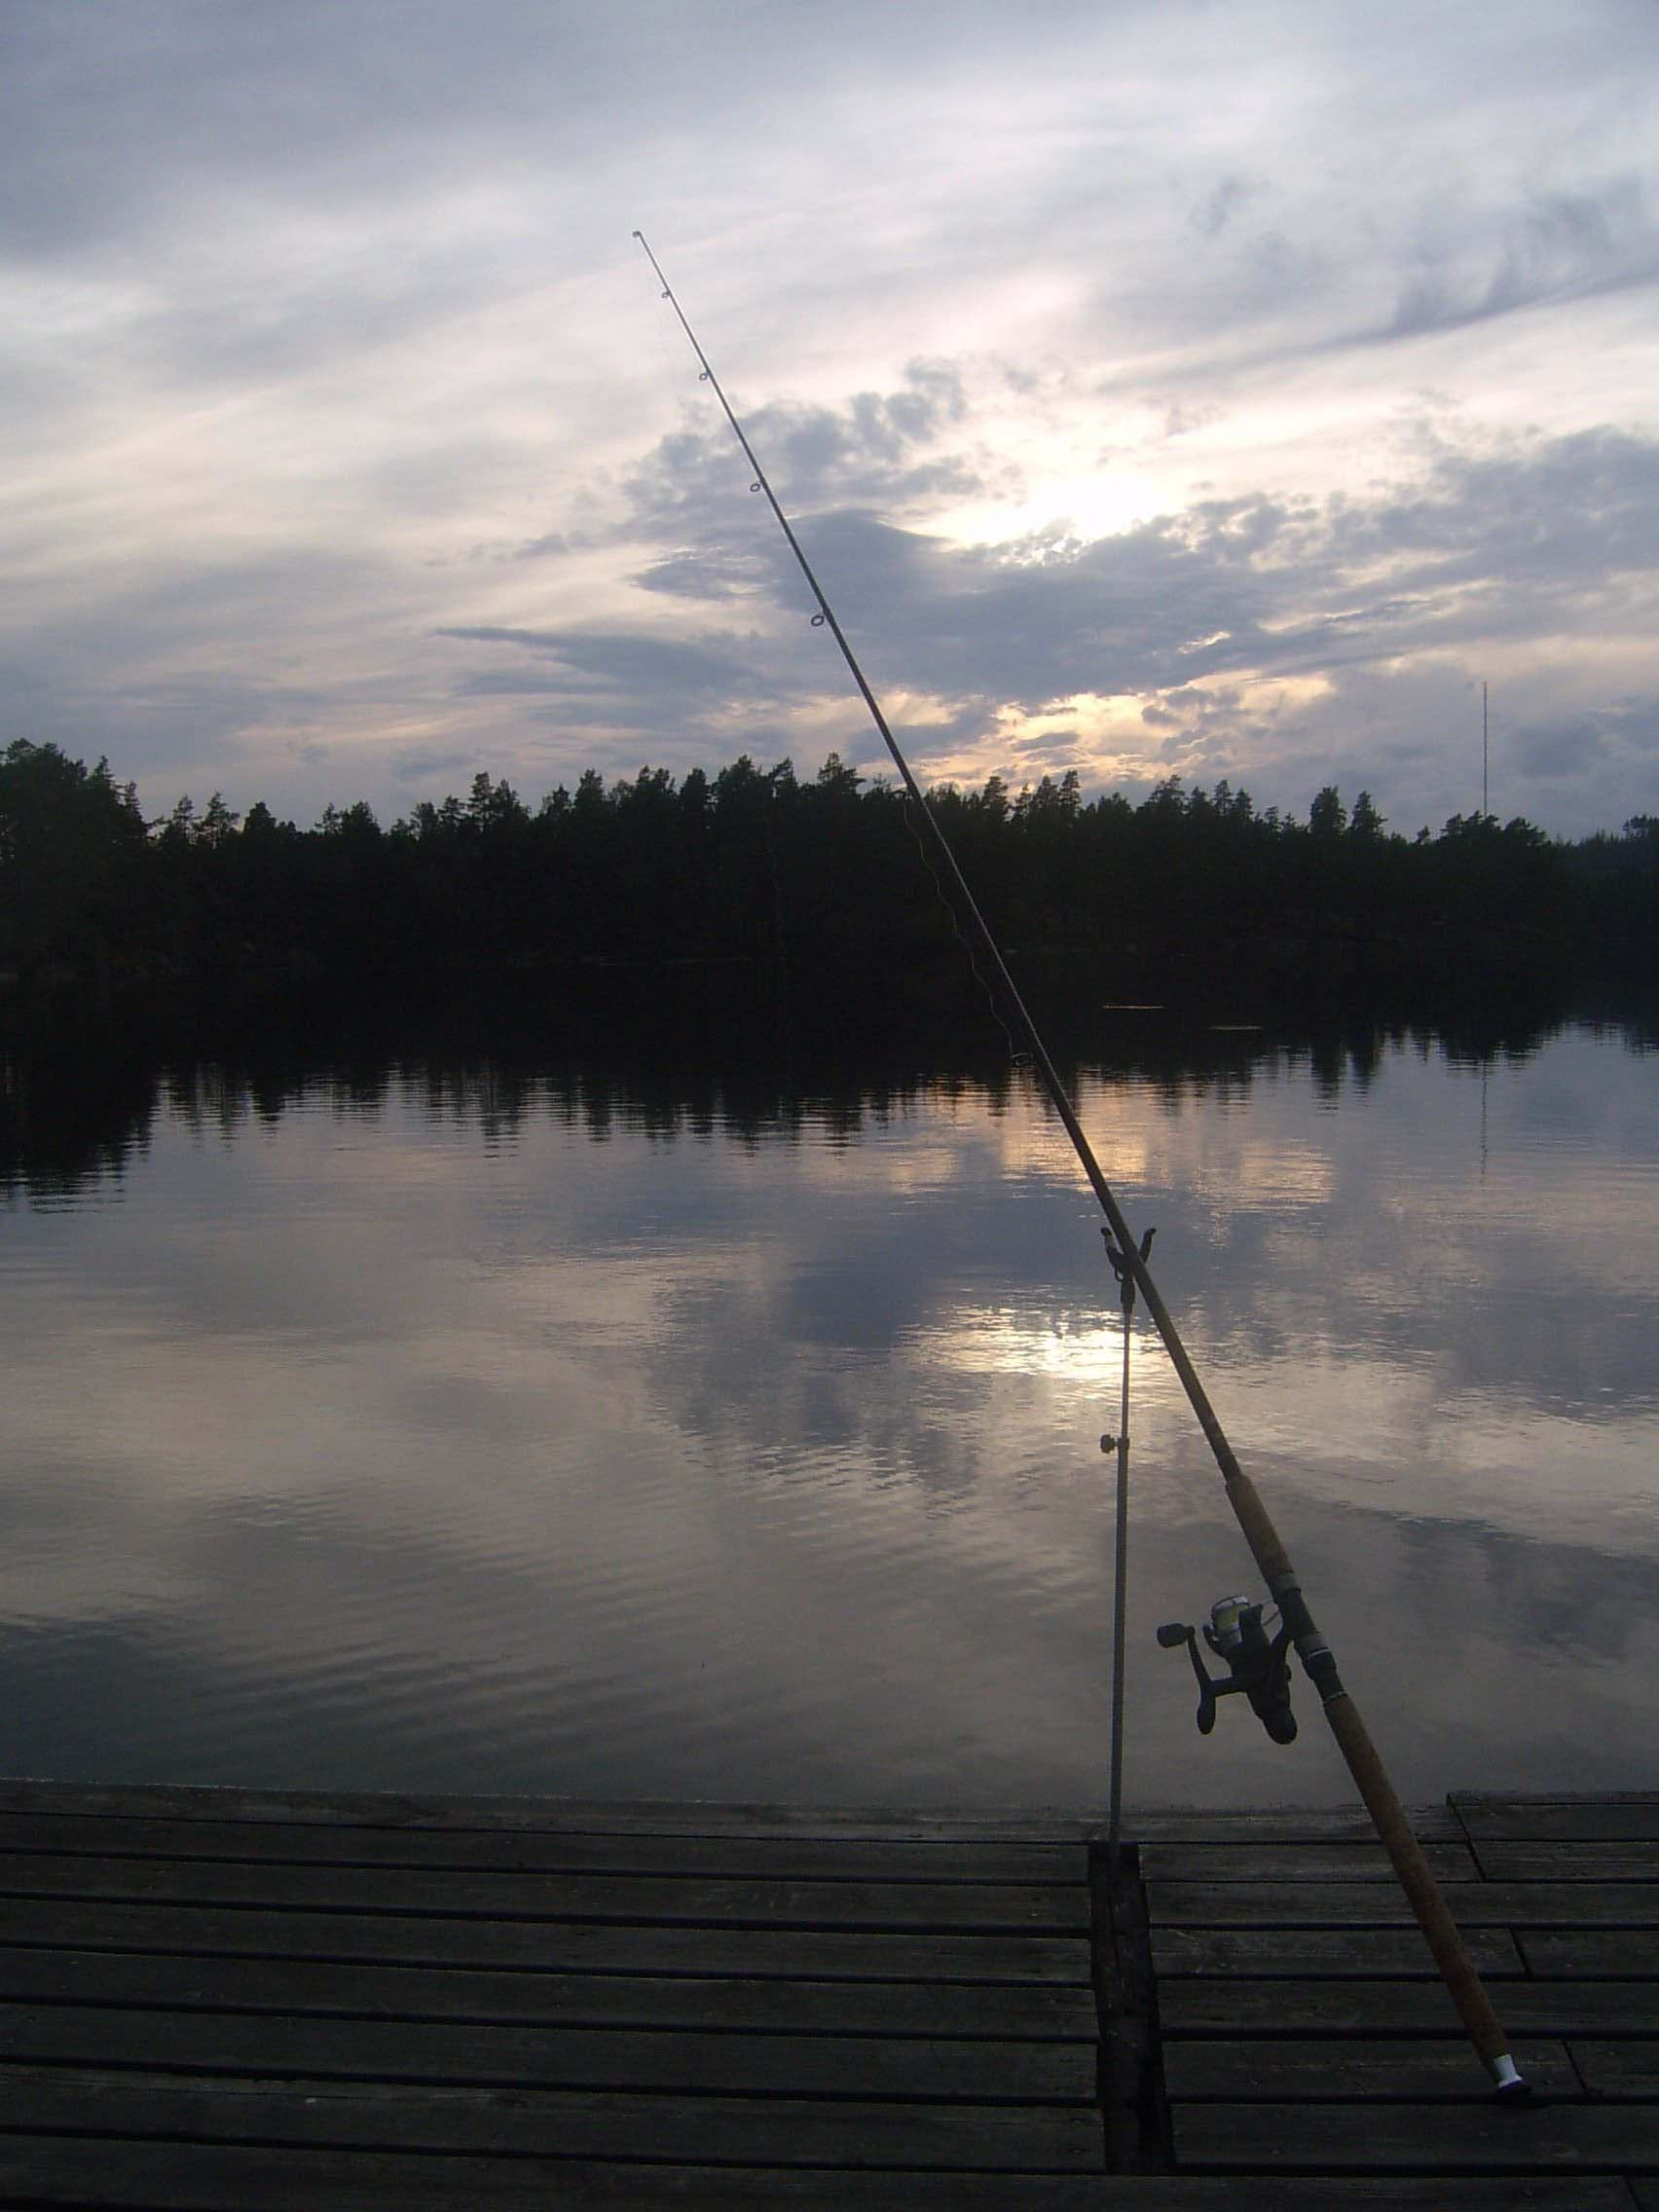 Hesjön, Stora Hammarsjöområdet